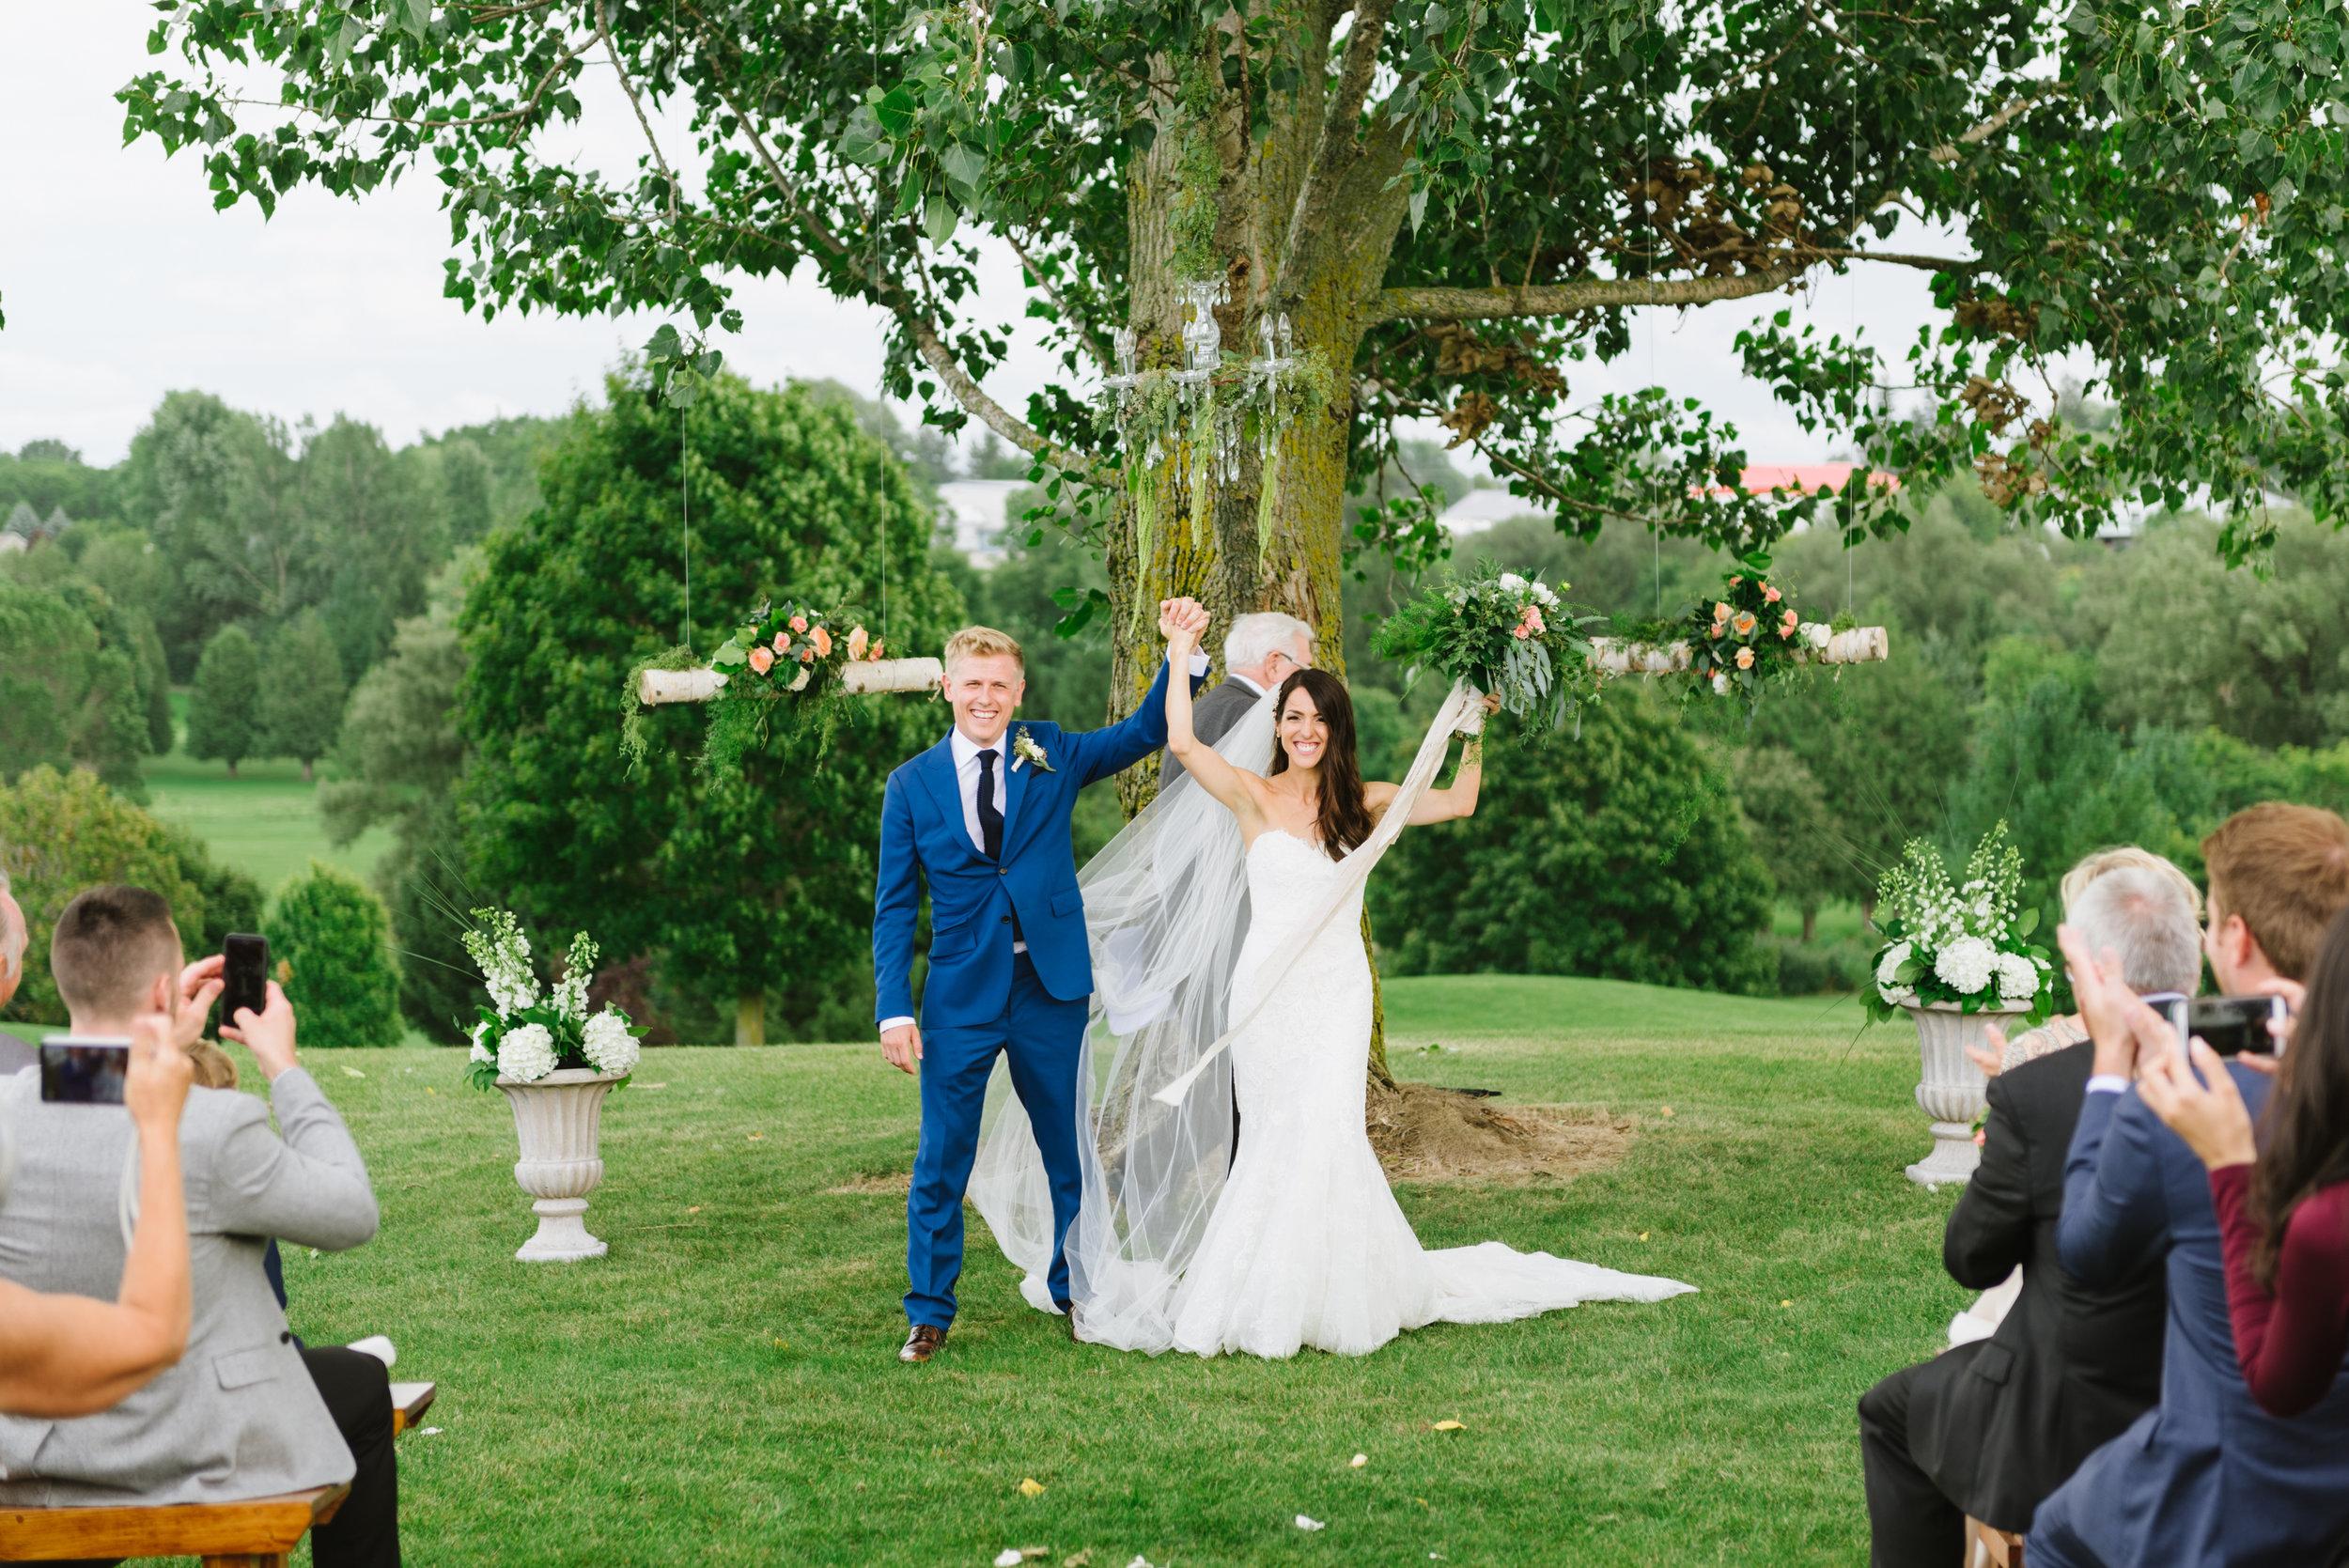 ceremony-outdoor-bride-groom